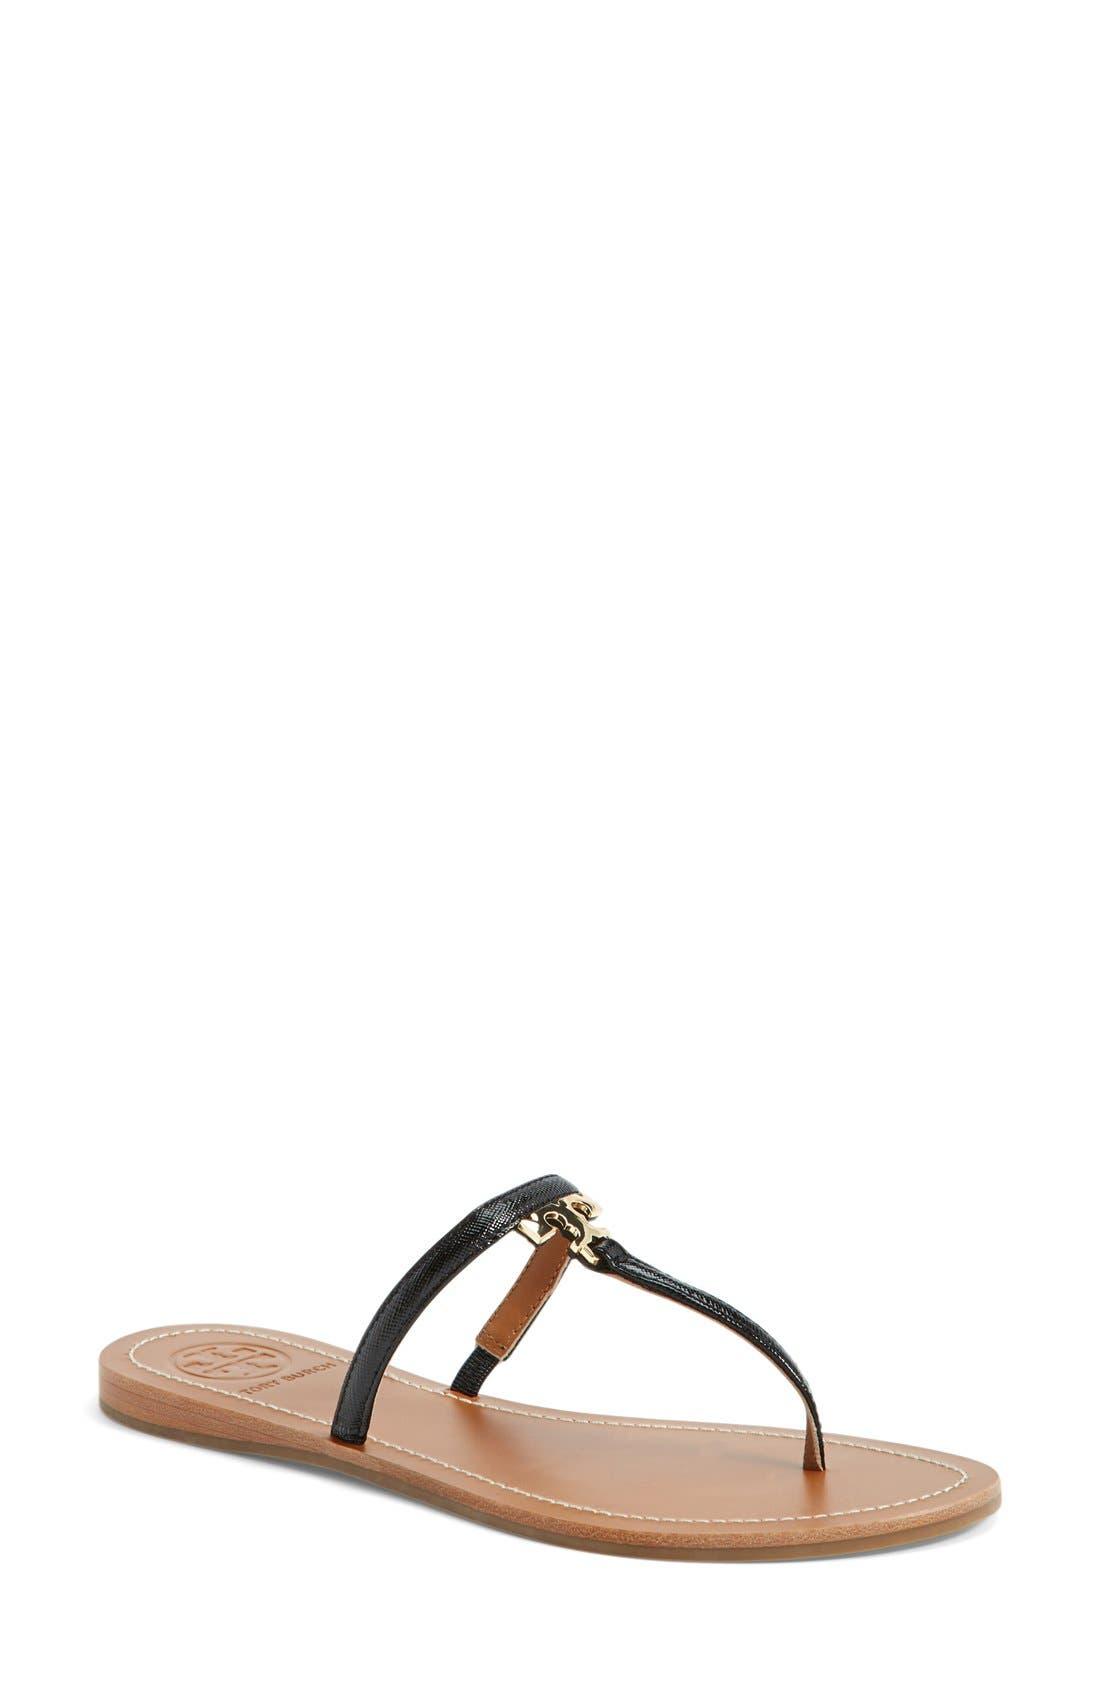 Alternate Image 1 Selected - Tory Burch 'T' Logo Leather Thong Sandal (Women)